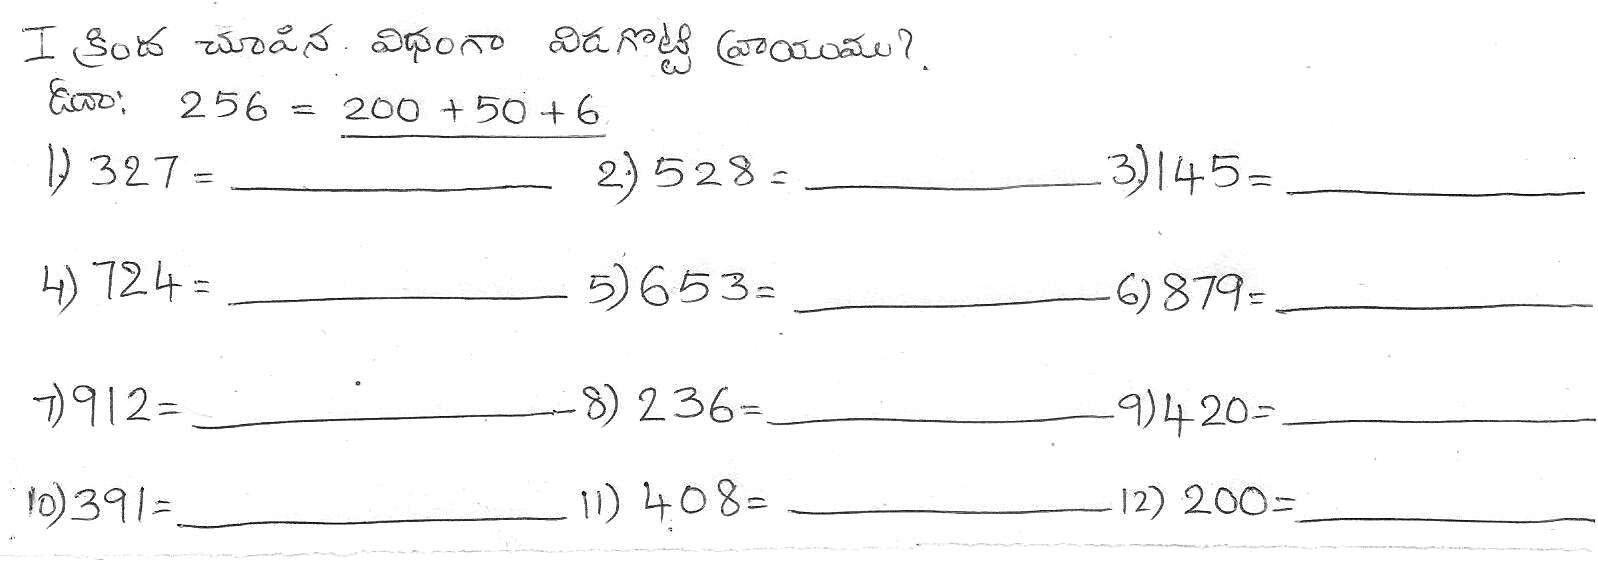 Pin By Rahim Pinjari On Maths Worksheets For 2 3 Grade Math Worksheets Math Math Worksheet [ 569 x 1598 Pixel ]